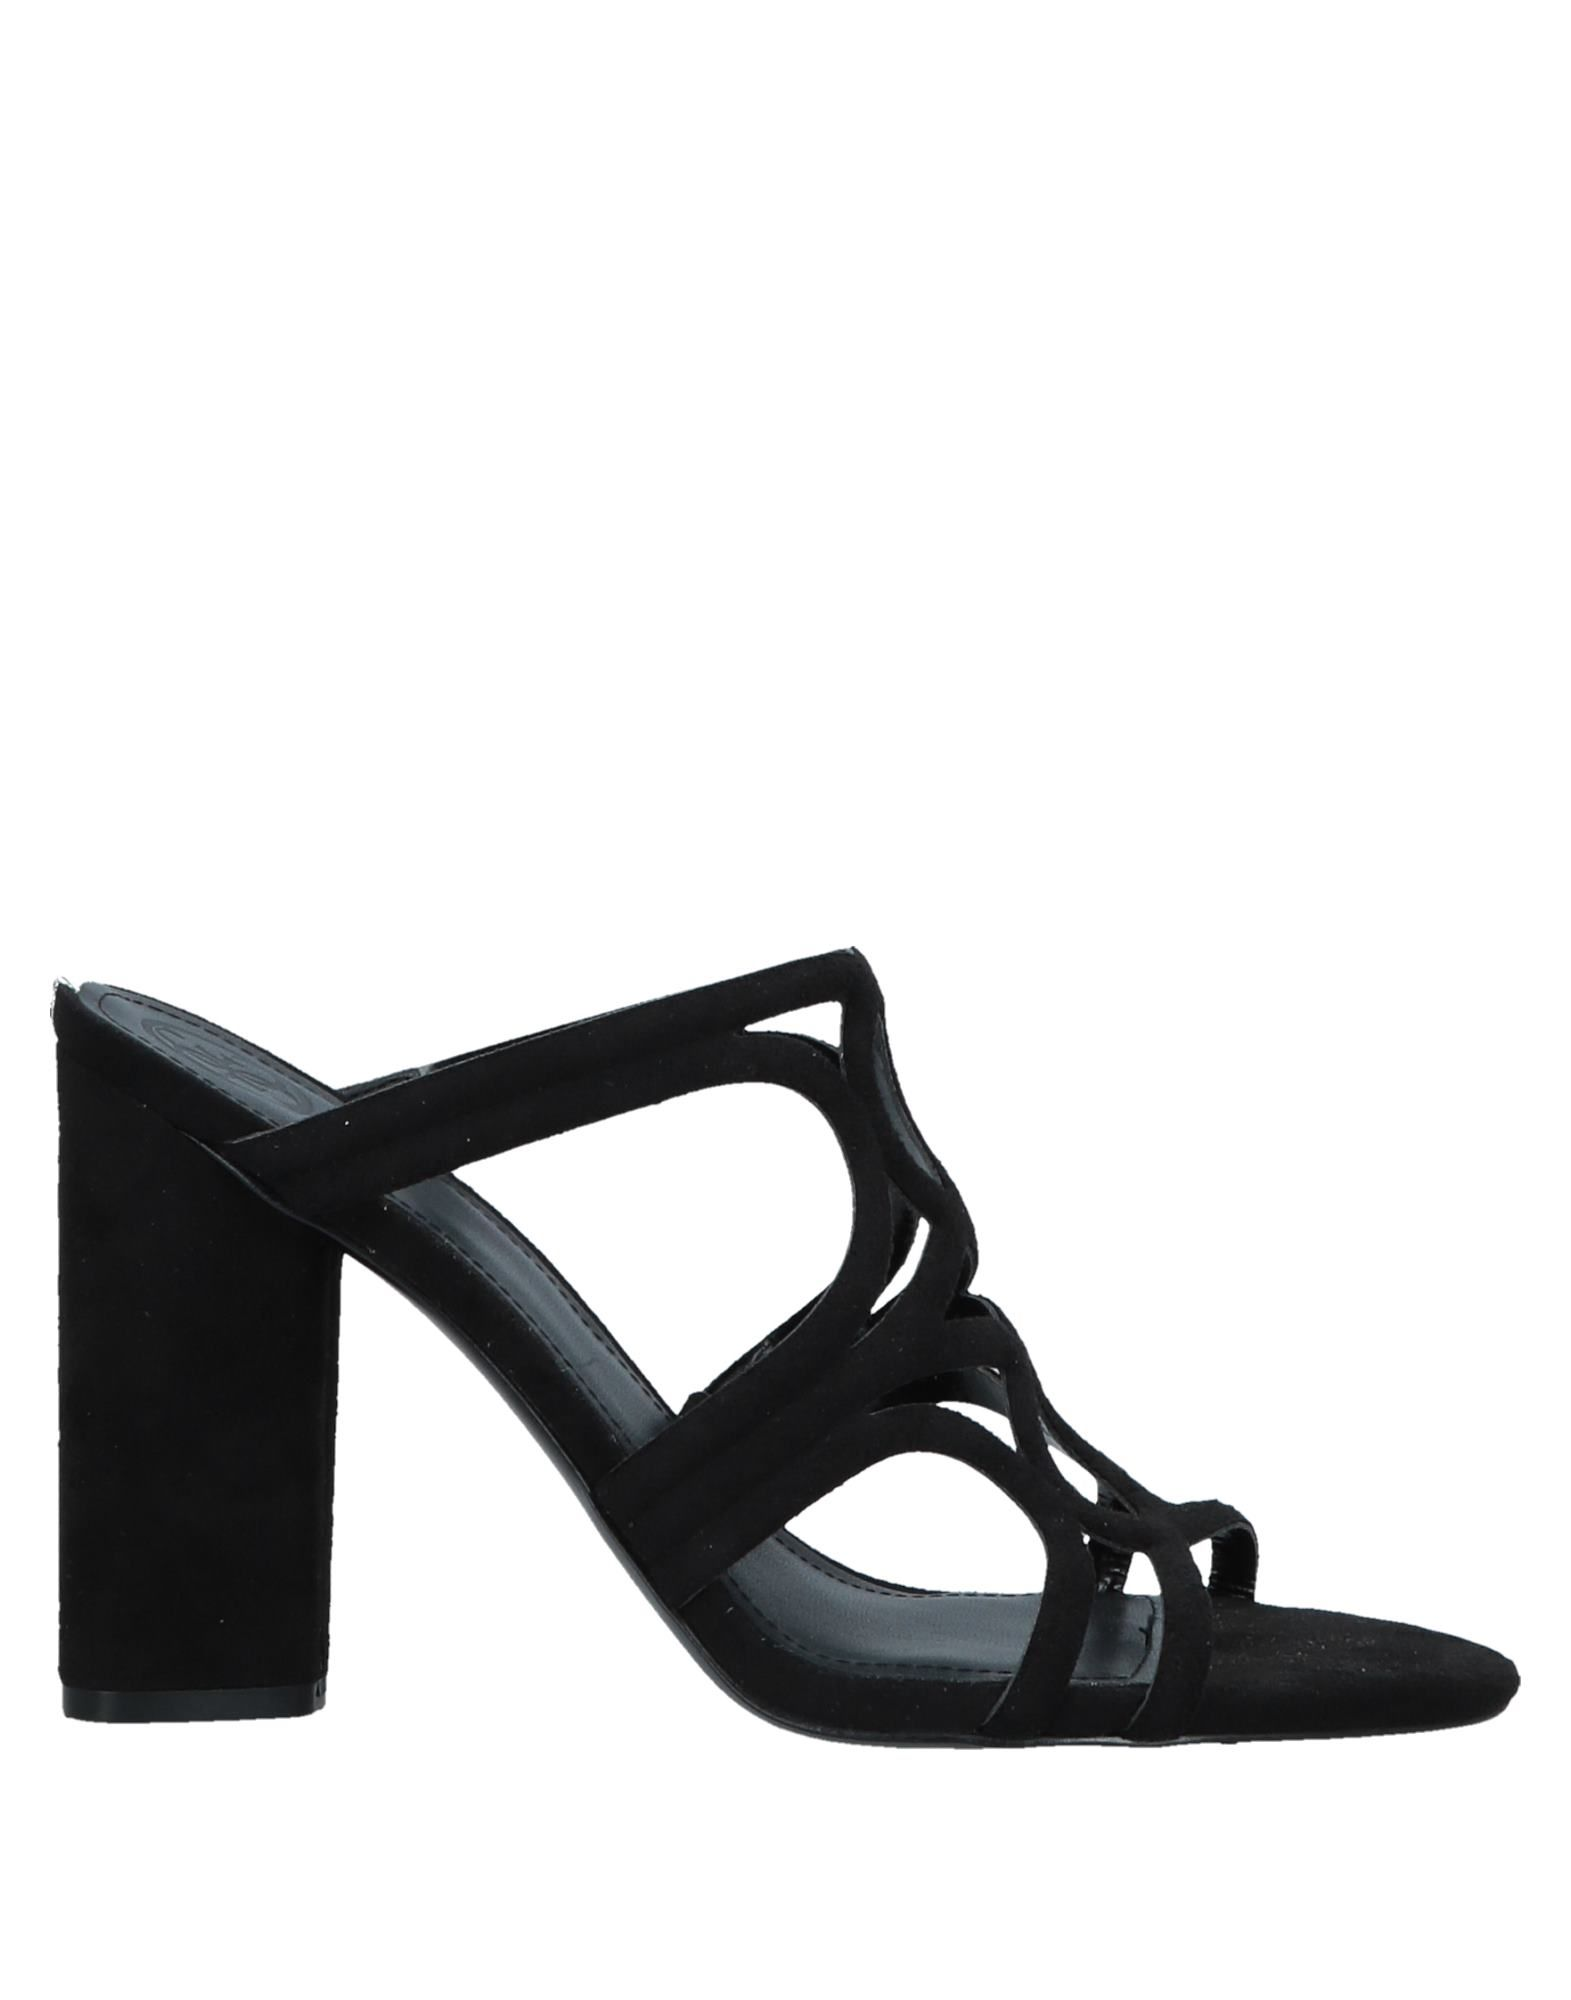 GUESS Damen Sandale3 schwarz